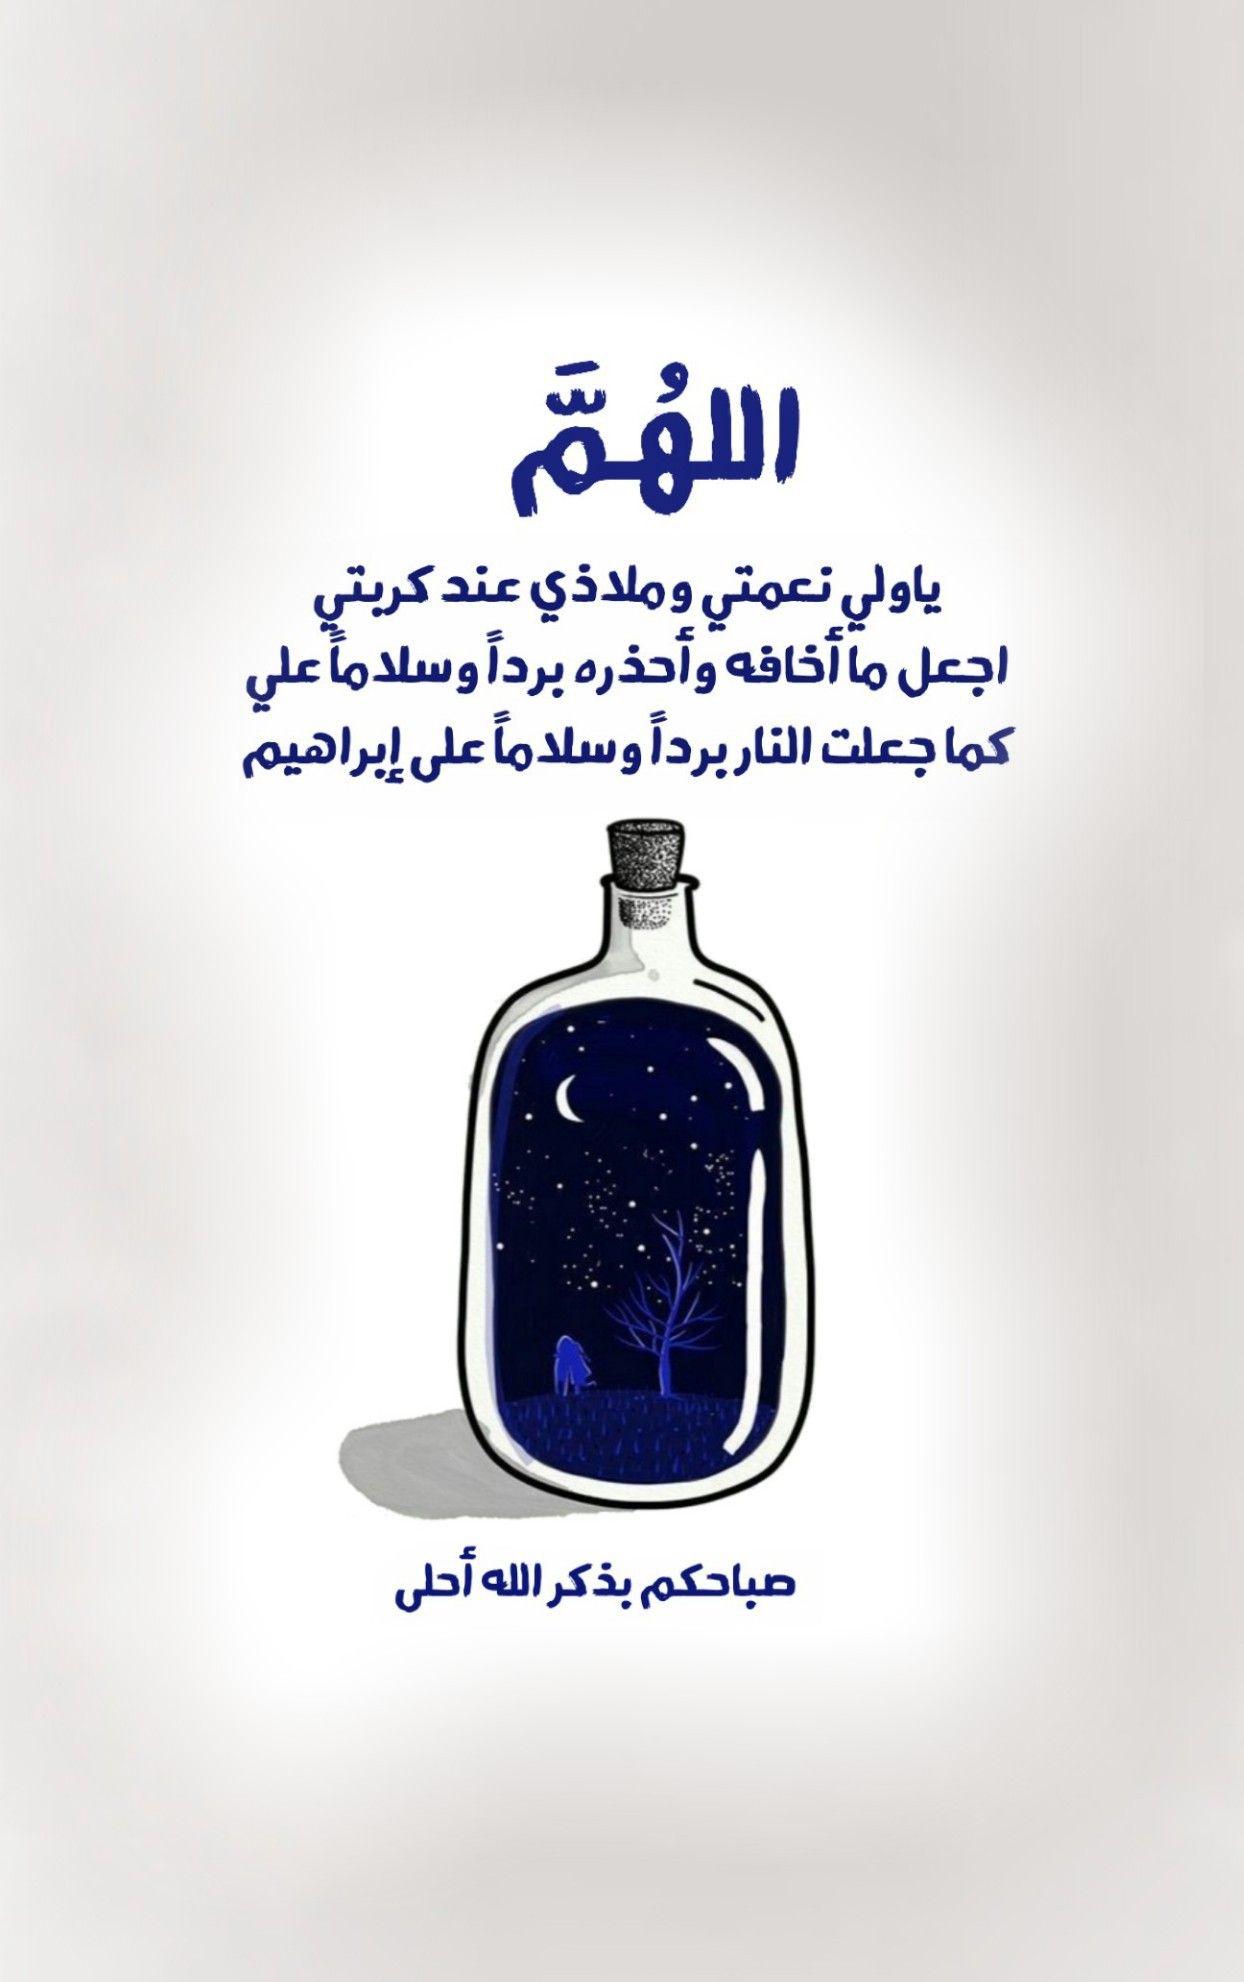 محمد عبده أوقد النار يا ش بابها تلفزيون جدة 1970 Movie Posters Poster Art